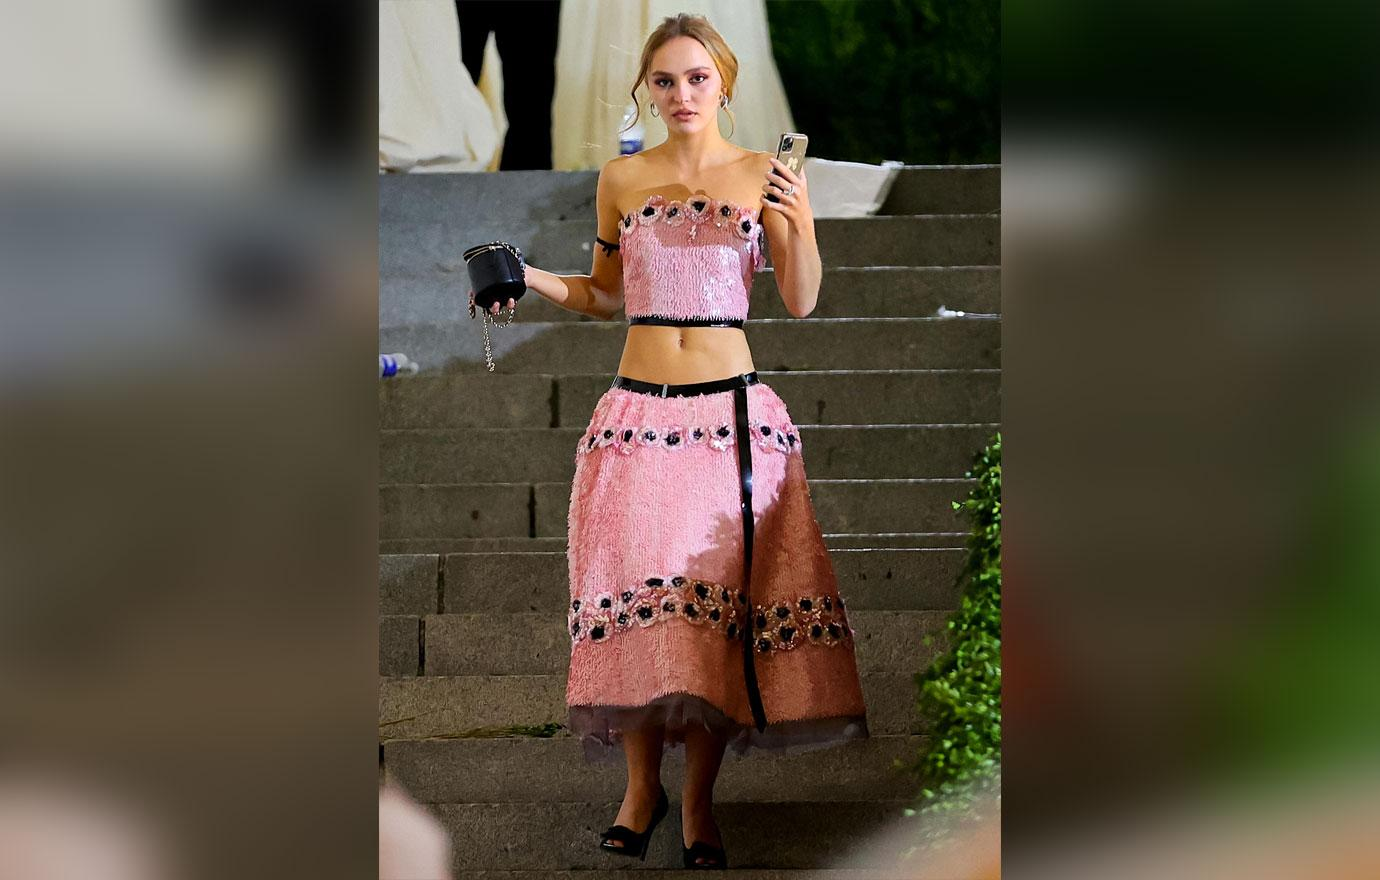 johnny depp daughter lily nyc photos no bra defamation lawsuit amber heard